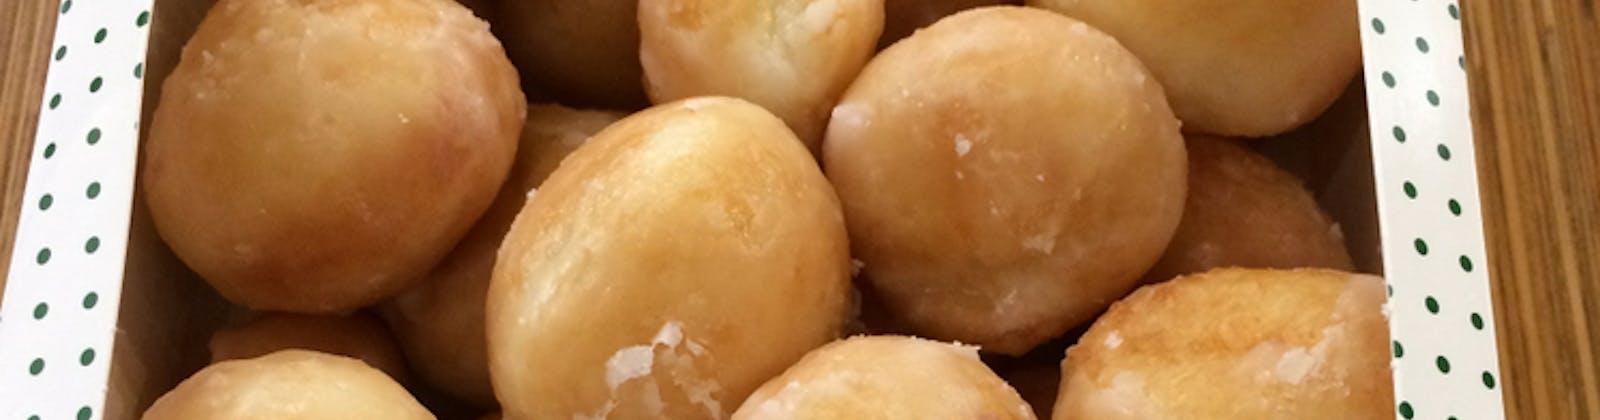 Krispy Kreme's bite sized glazed donuts